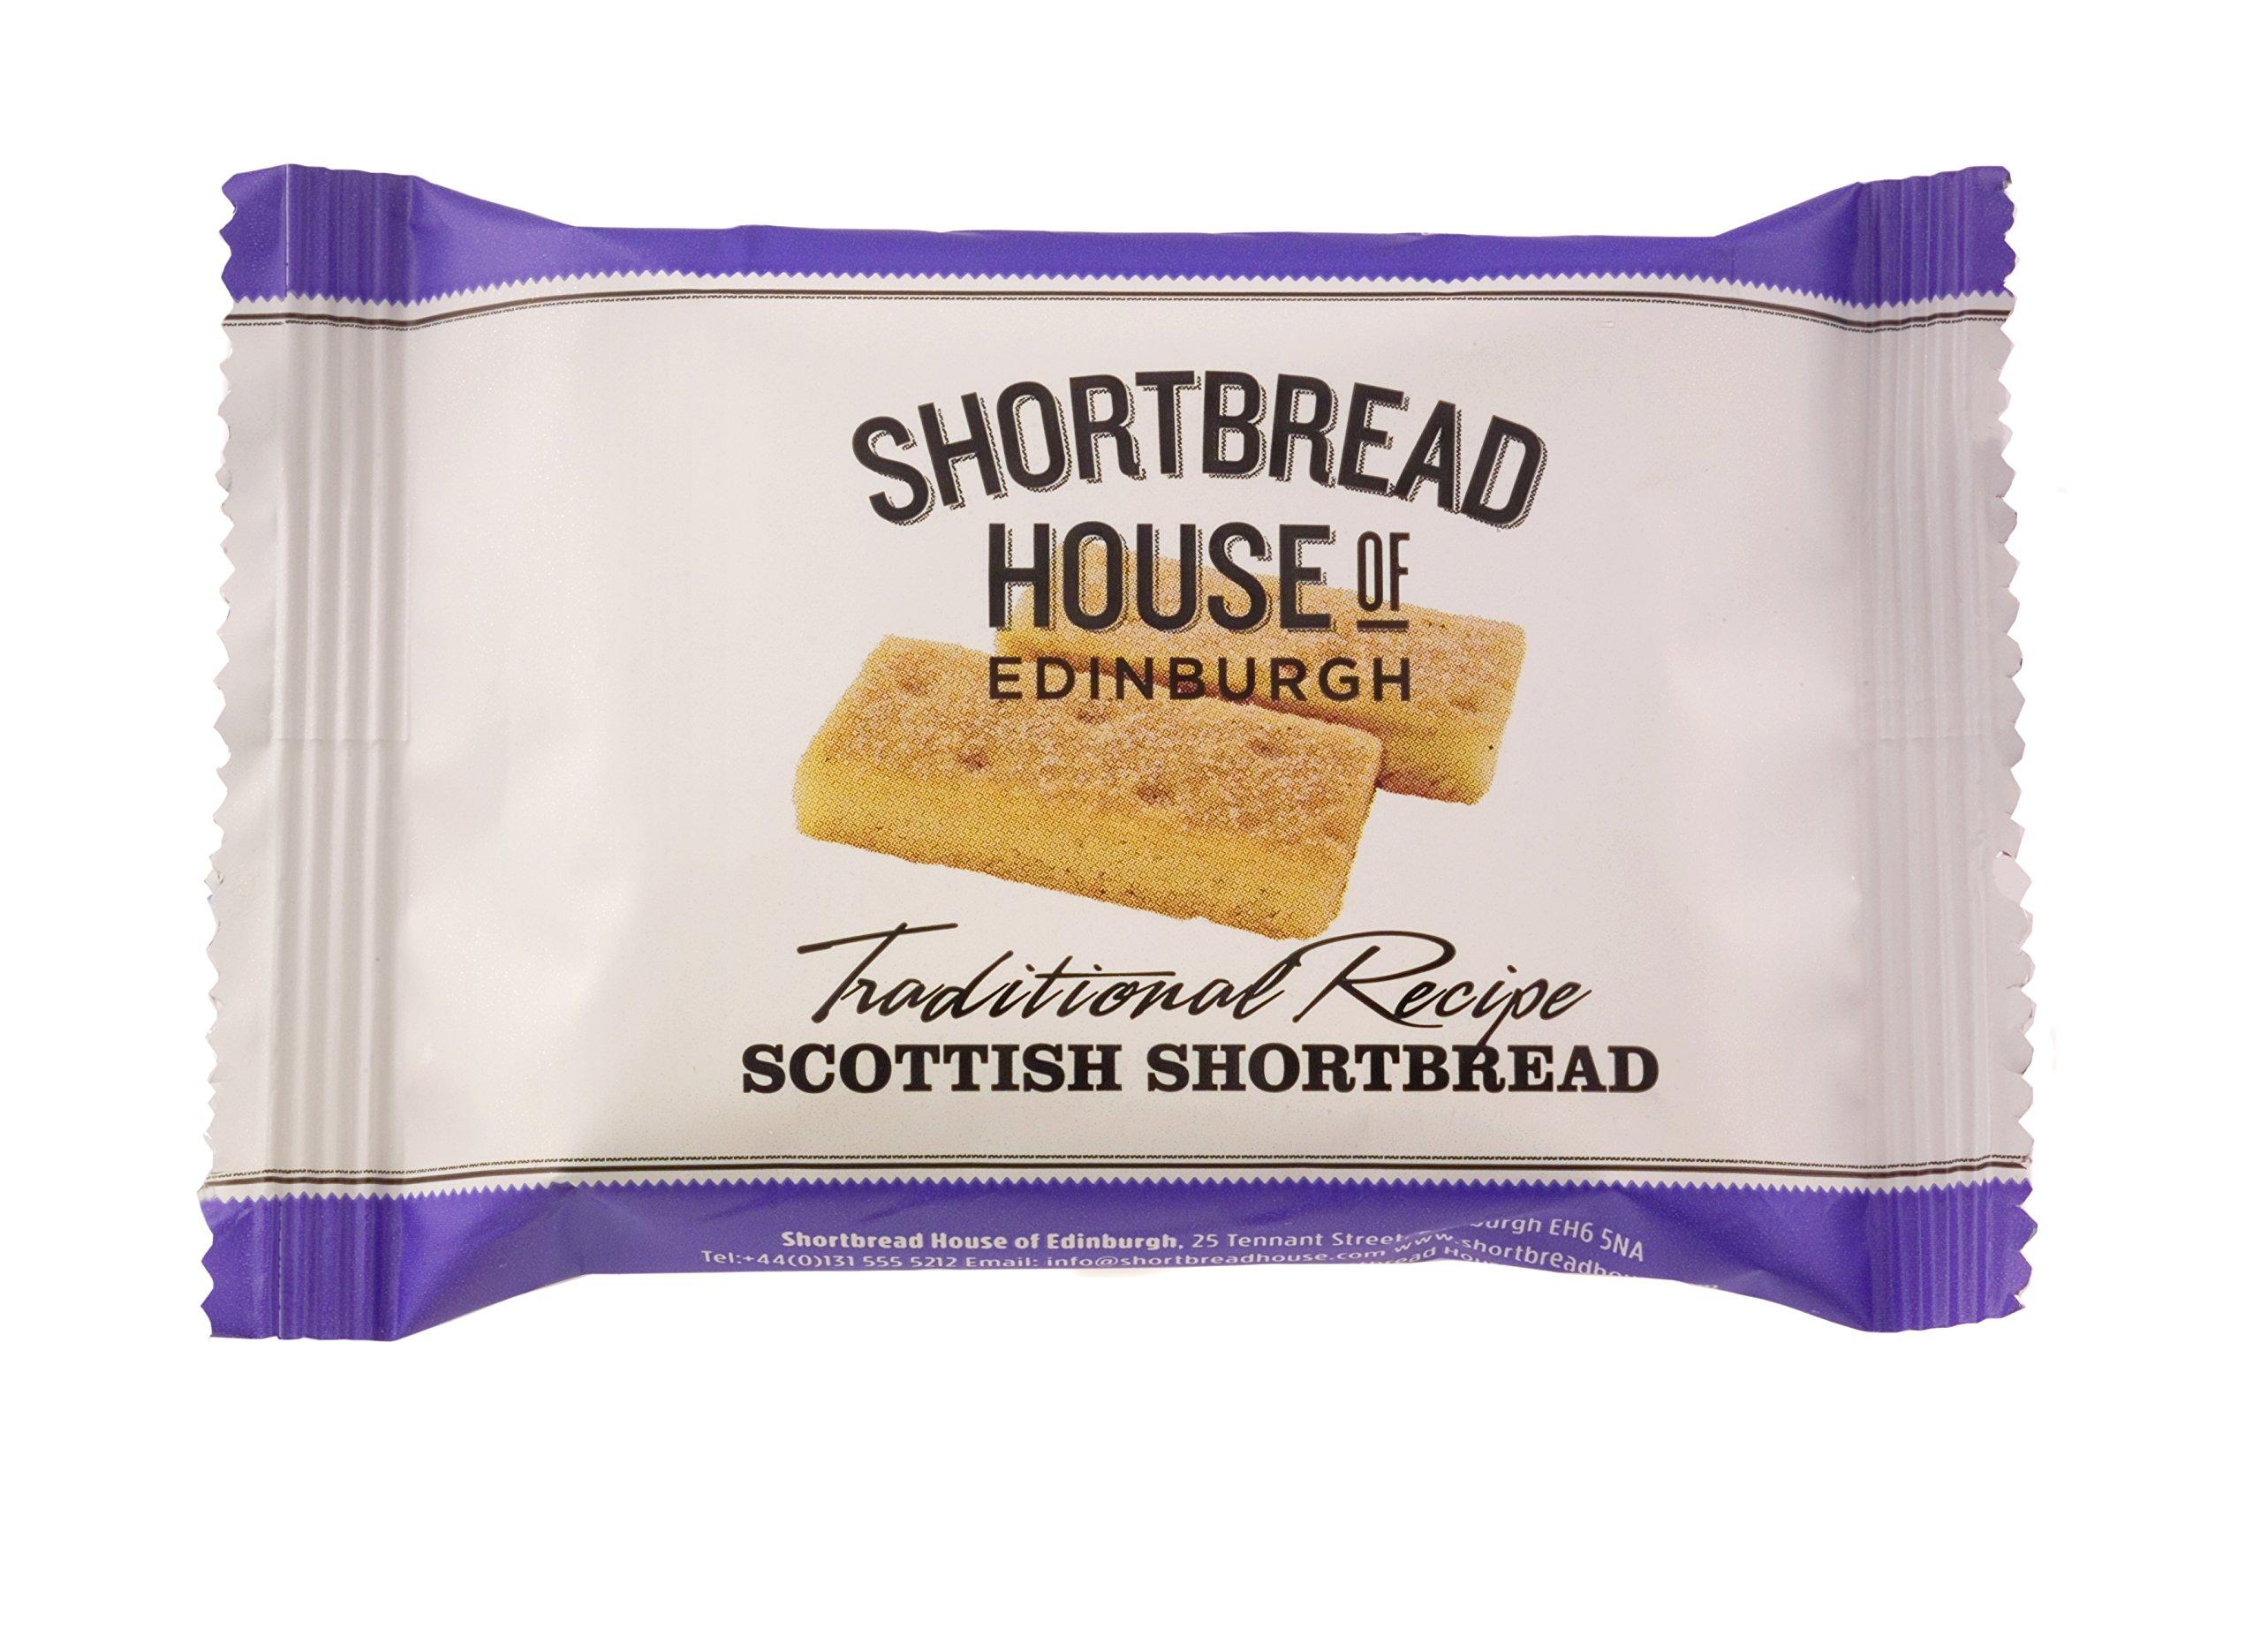 Shortbread House of Edinburgh Original Recipe Fingers (Case of 60 Packs)